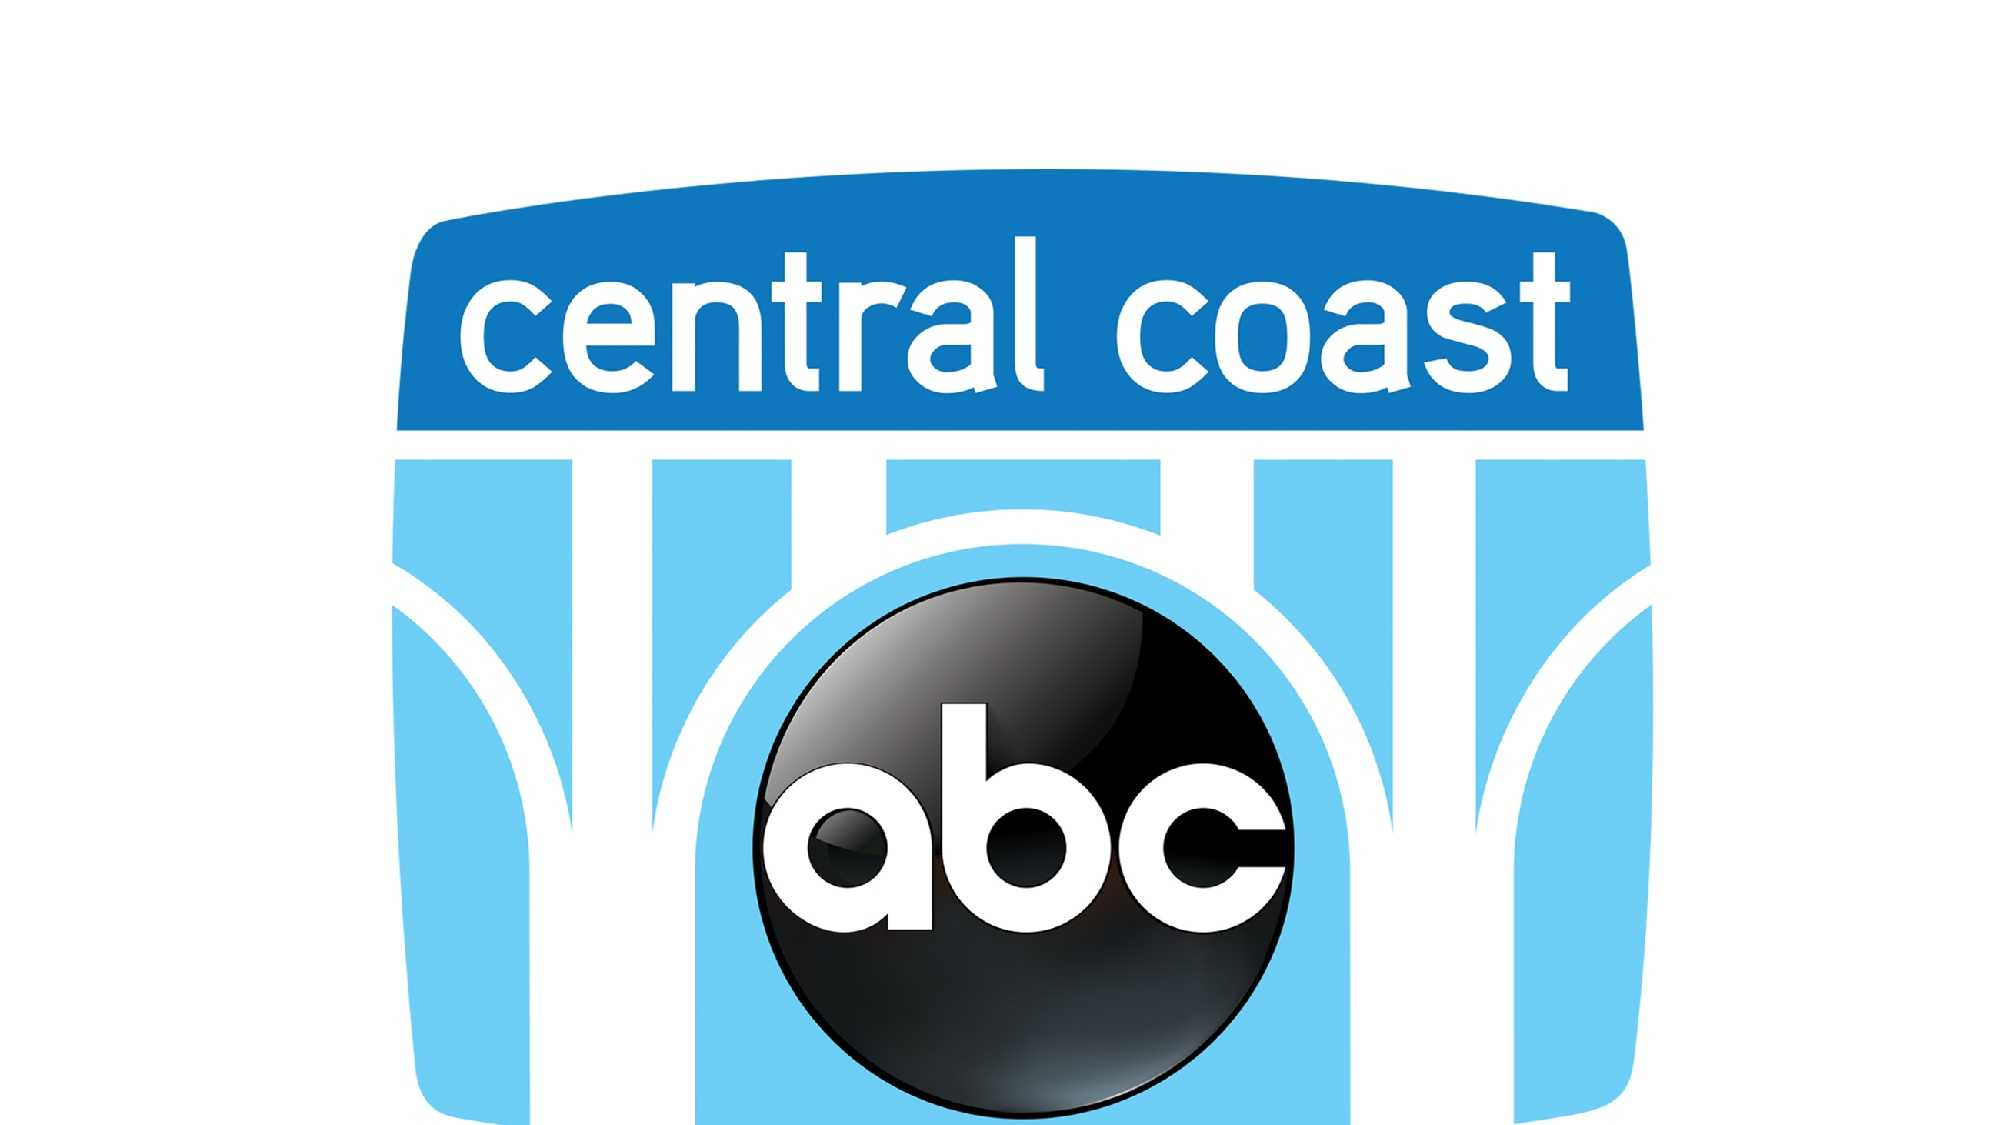 CC ABC